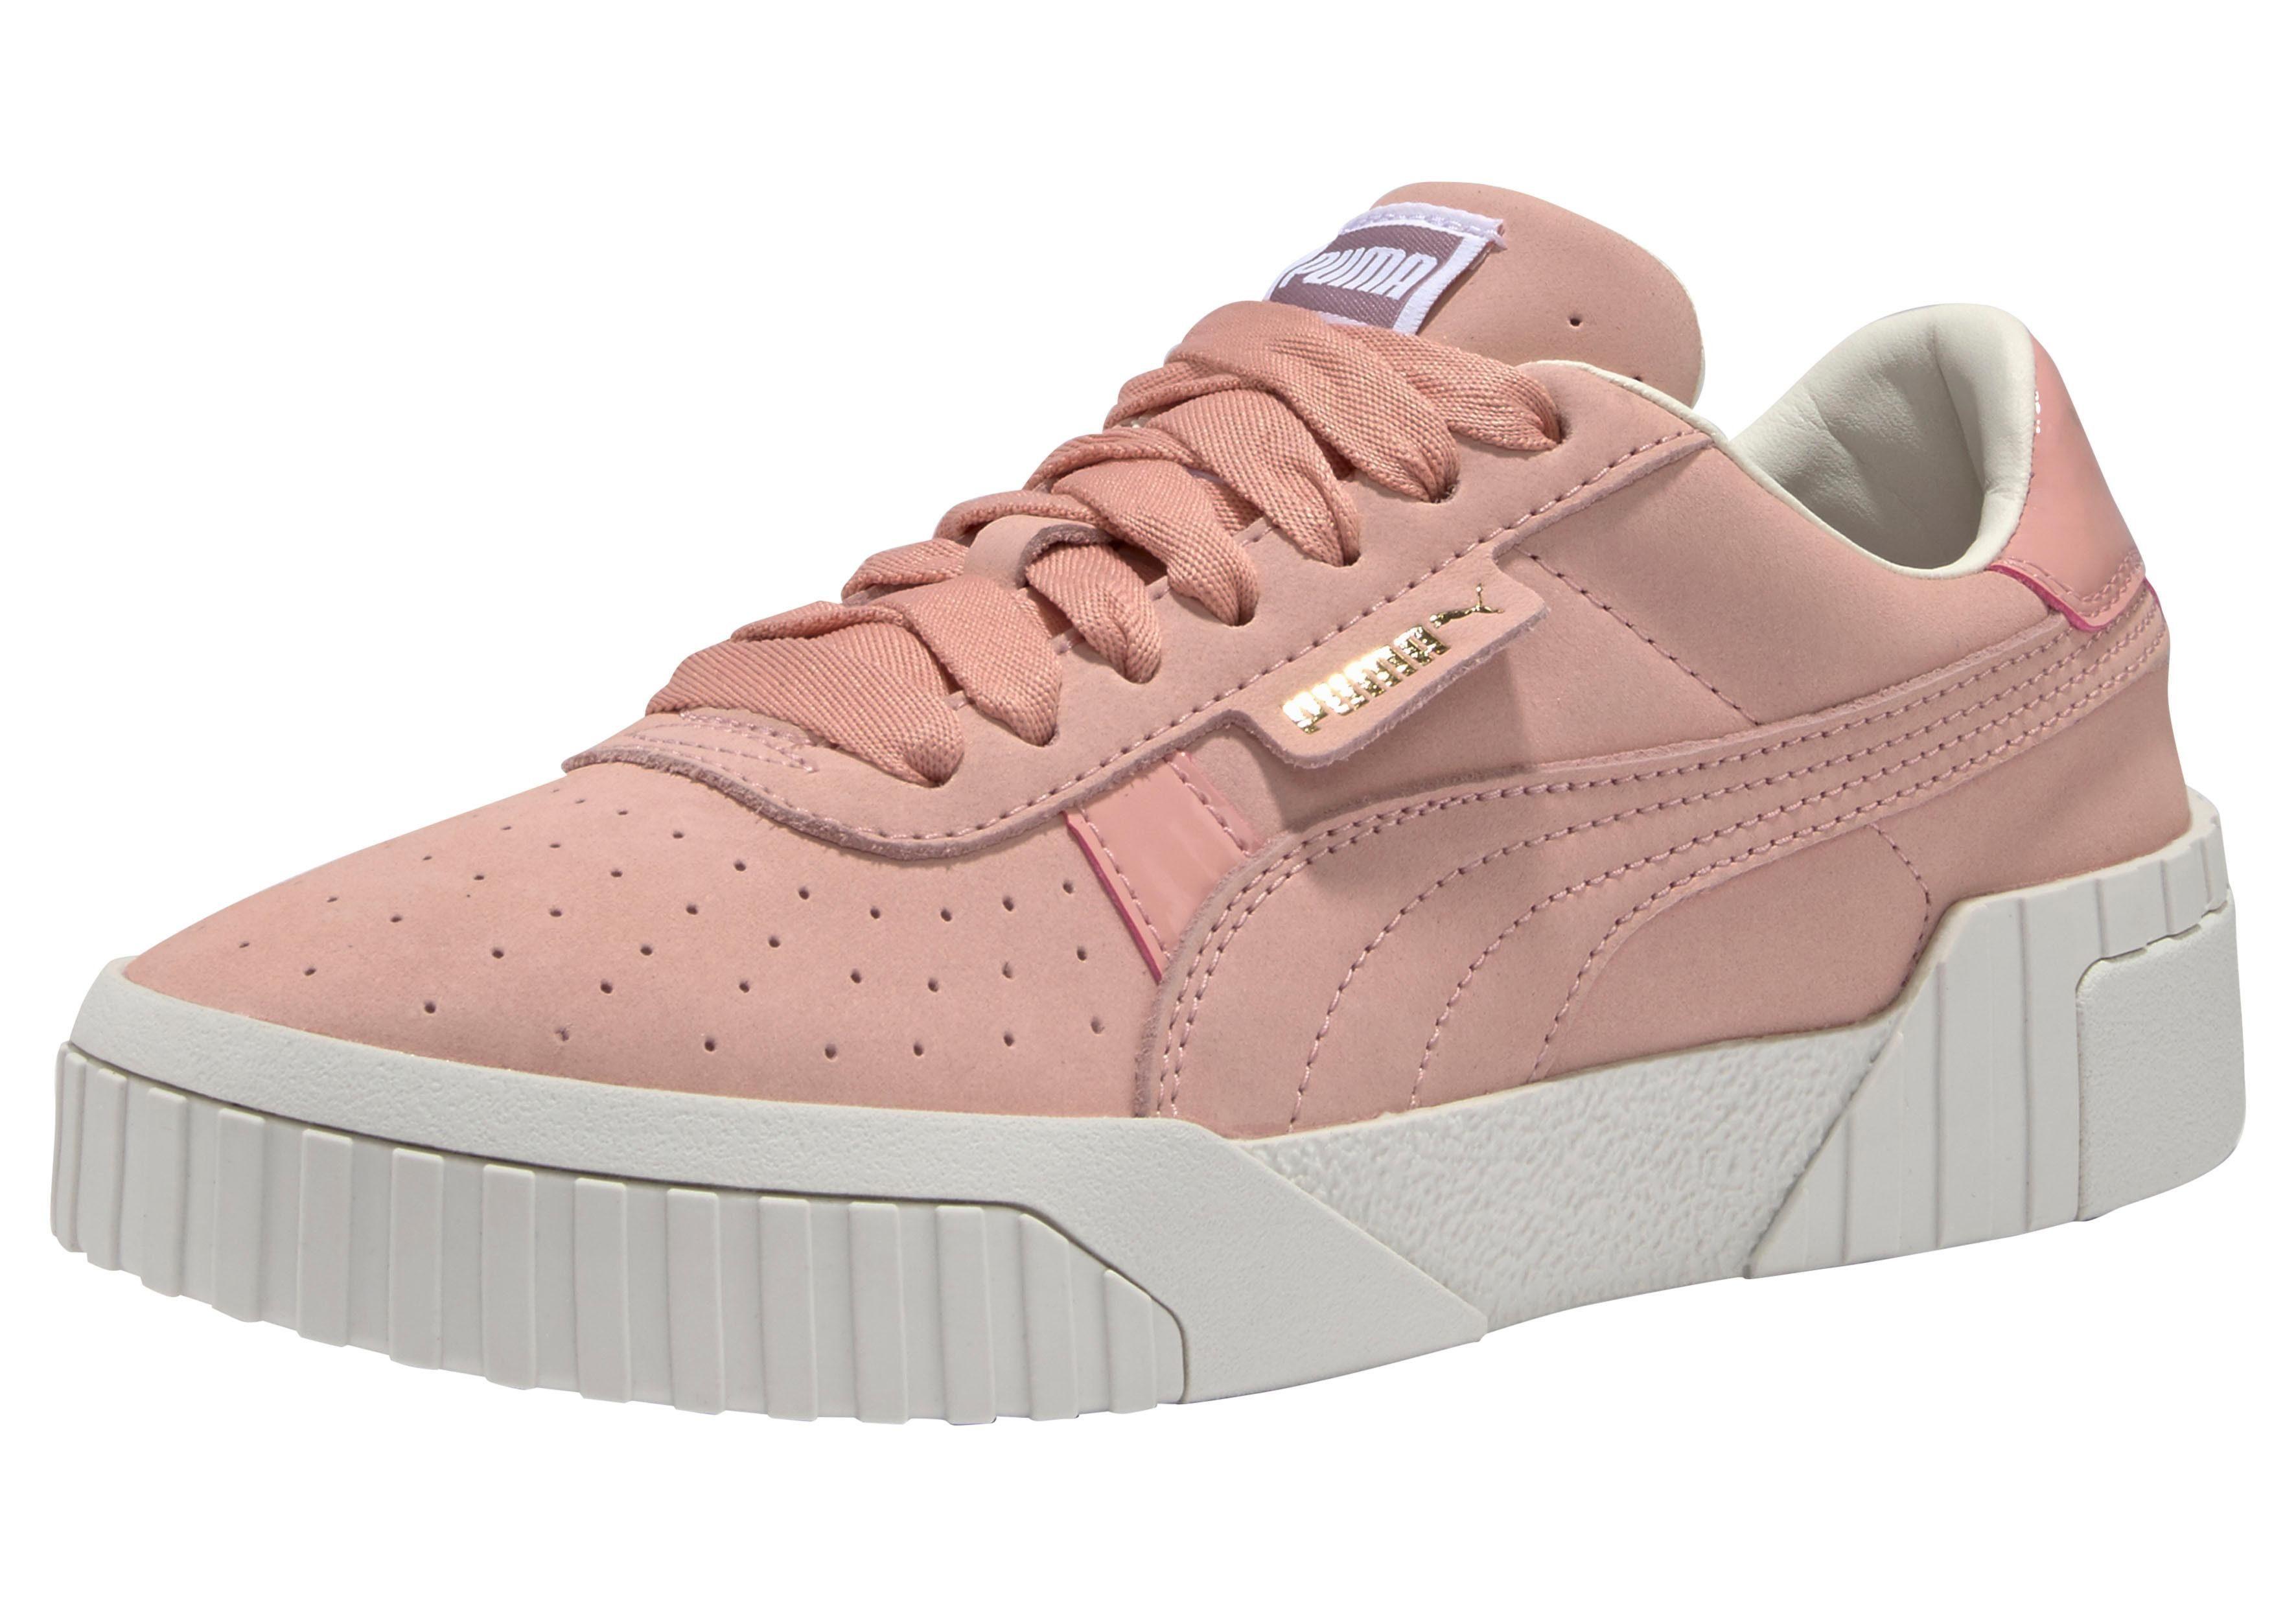 PUMA »Cali Nubuck Wn's« Sneaker online kaufen | OTTO